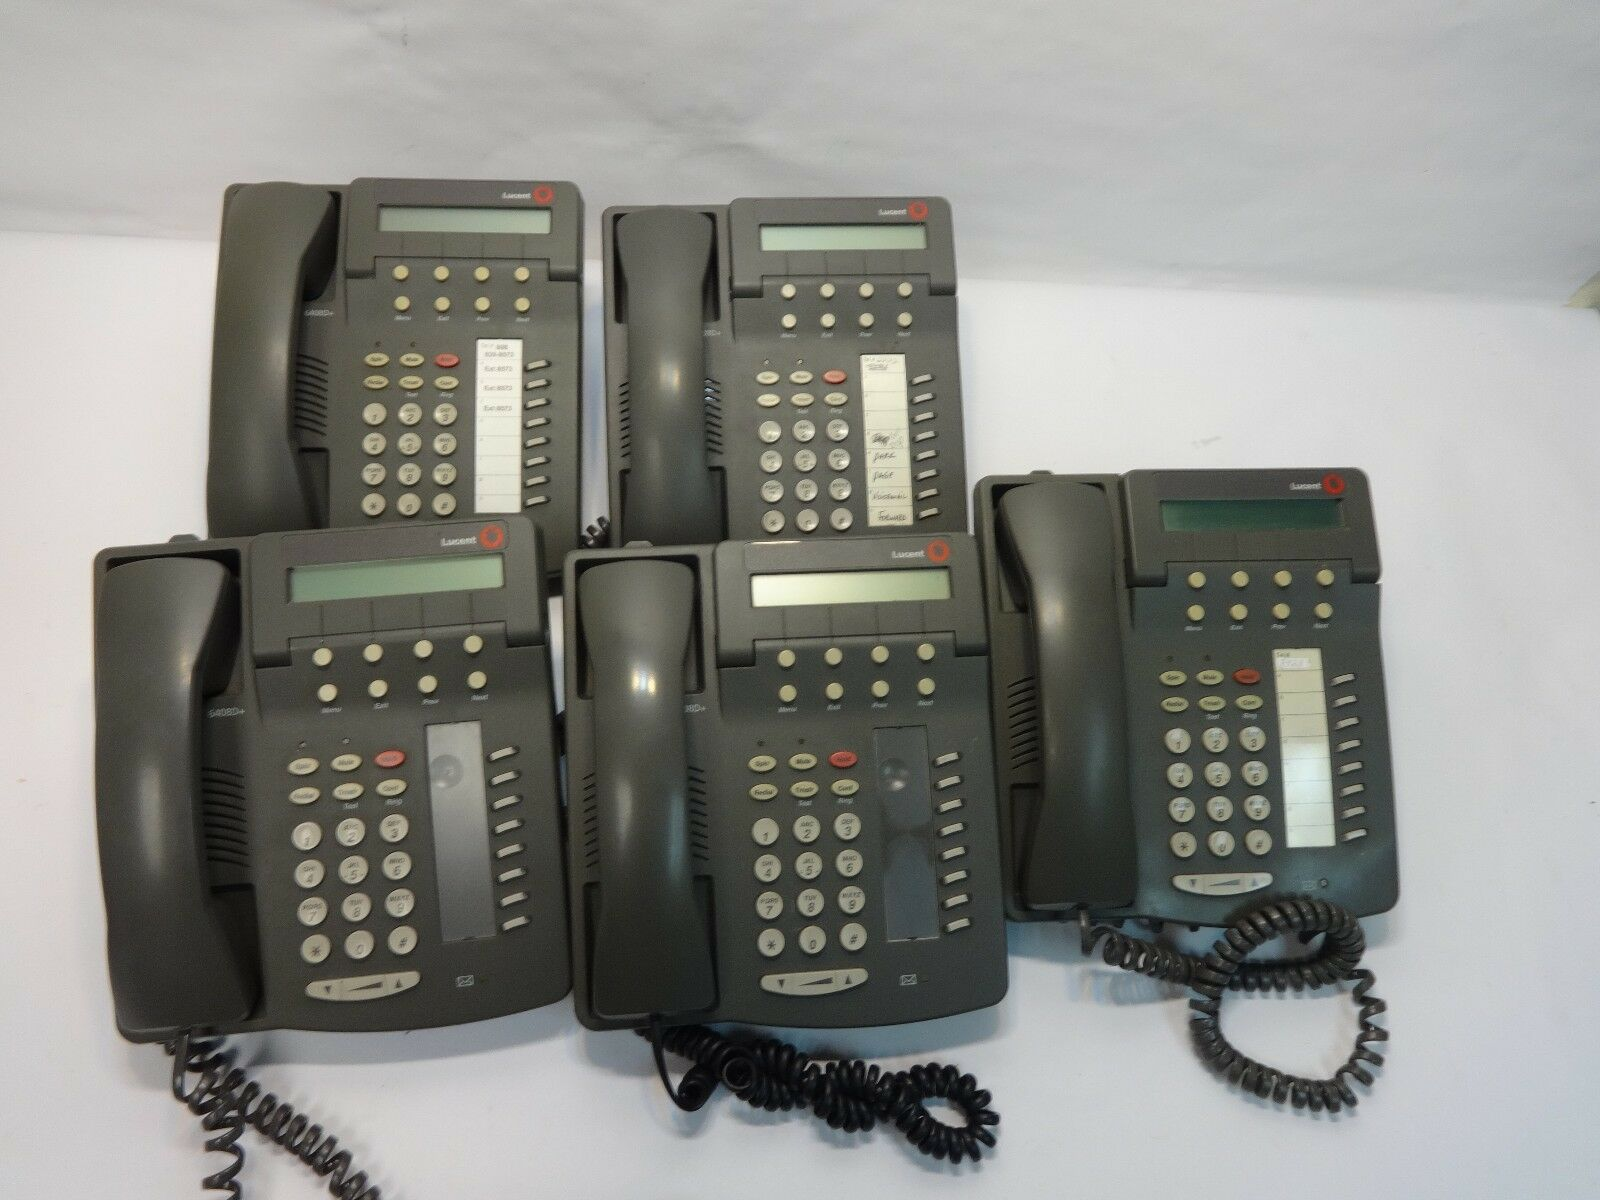 lot 5 lucent 6408d business grade 8 line office ethernet ip phone ebay rh ebay com lucent 6408d+ manual lucent 6408d+ manual